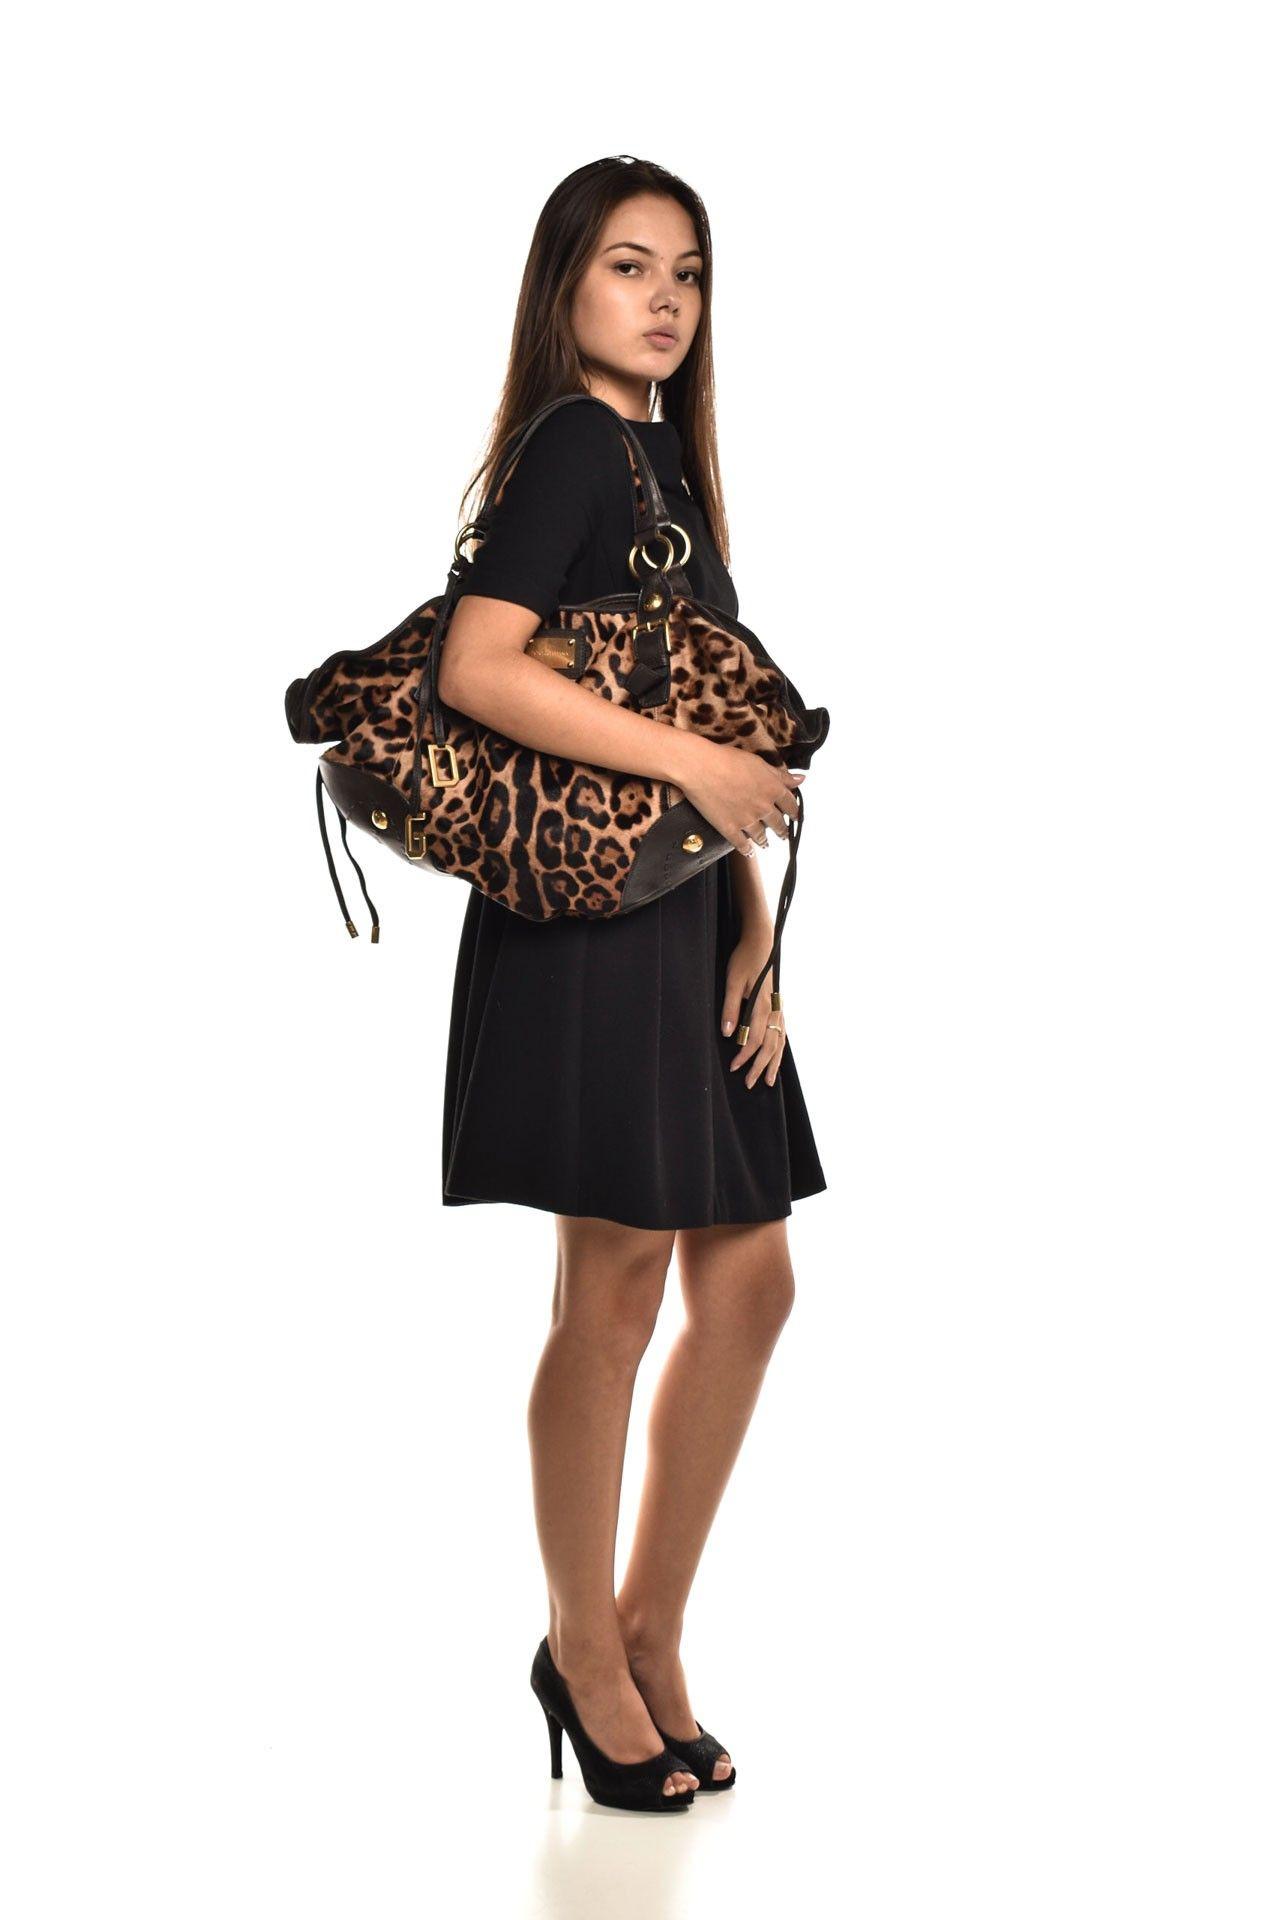 Dolce & Gabbana - Bolsa Estampa Onça - Foto 9